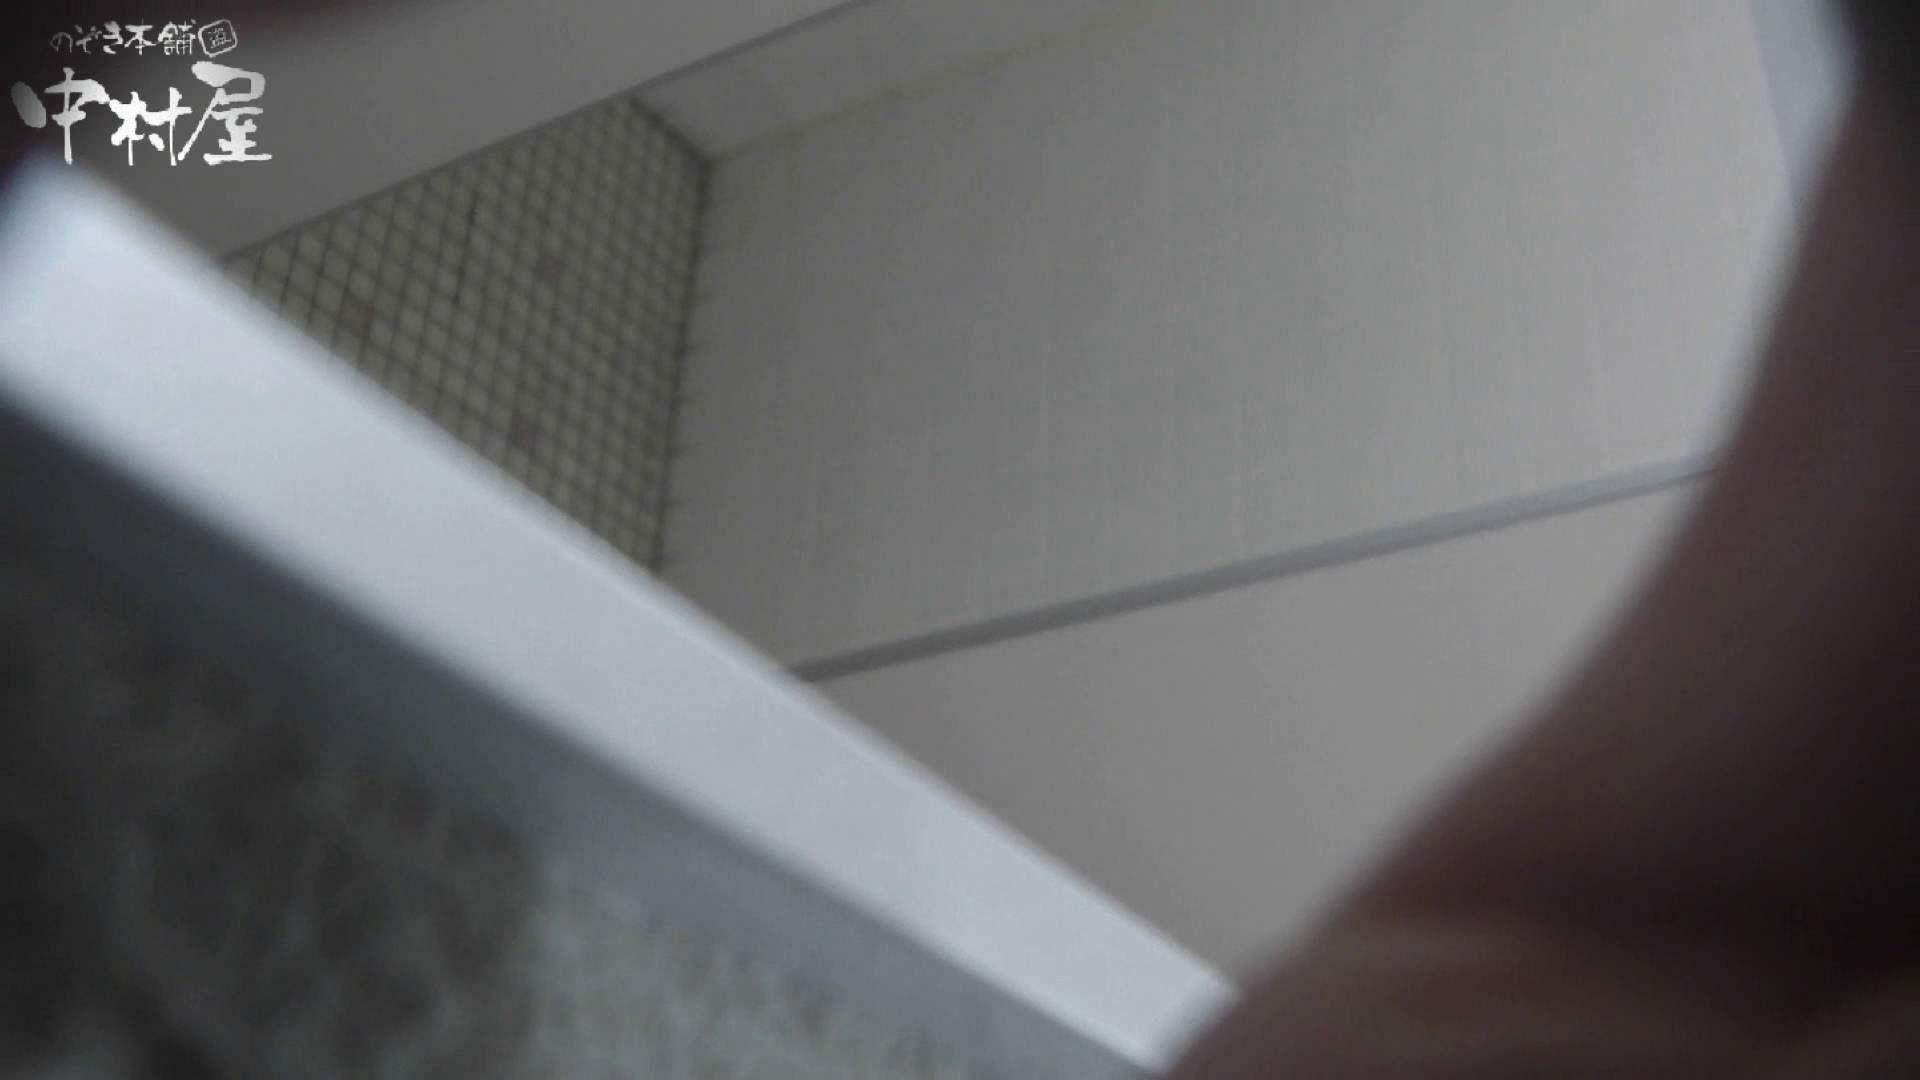 vol.21 命がけ潜伏洗面所! よ~く拭きましょう 潜入シリーズ  43Pix 40